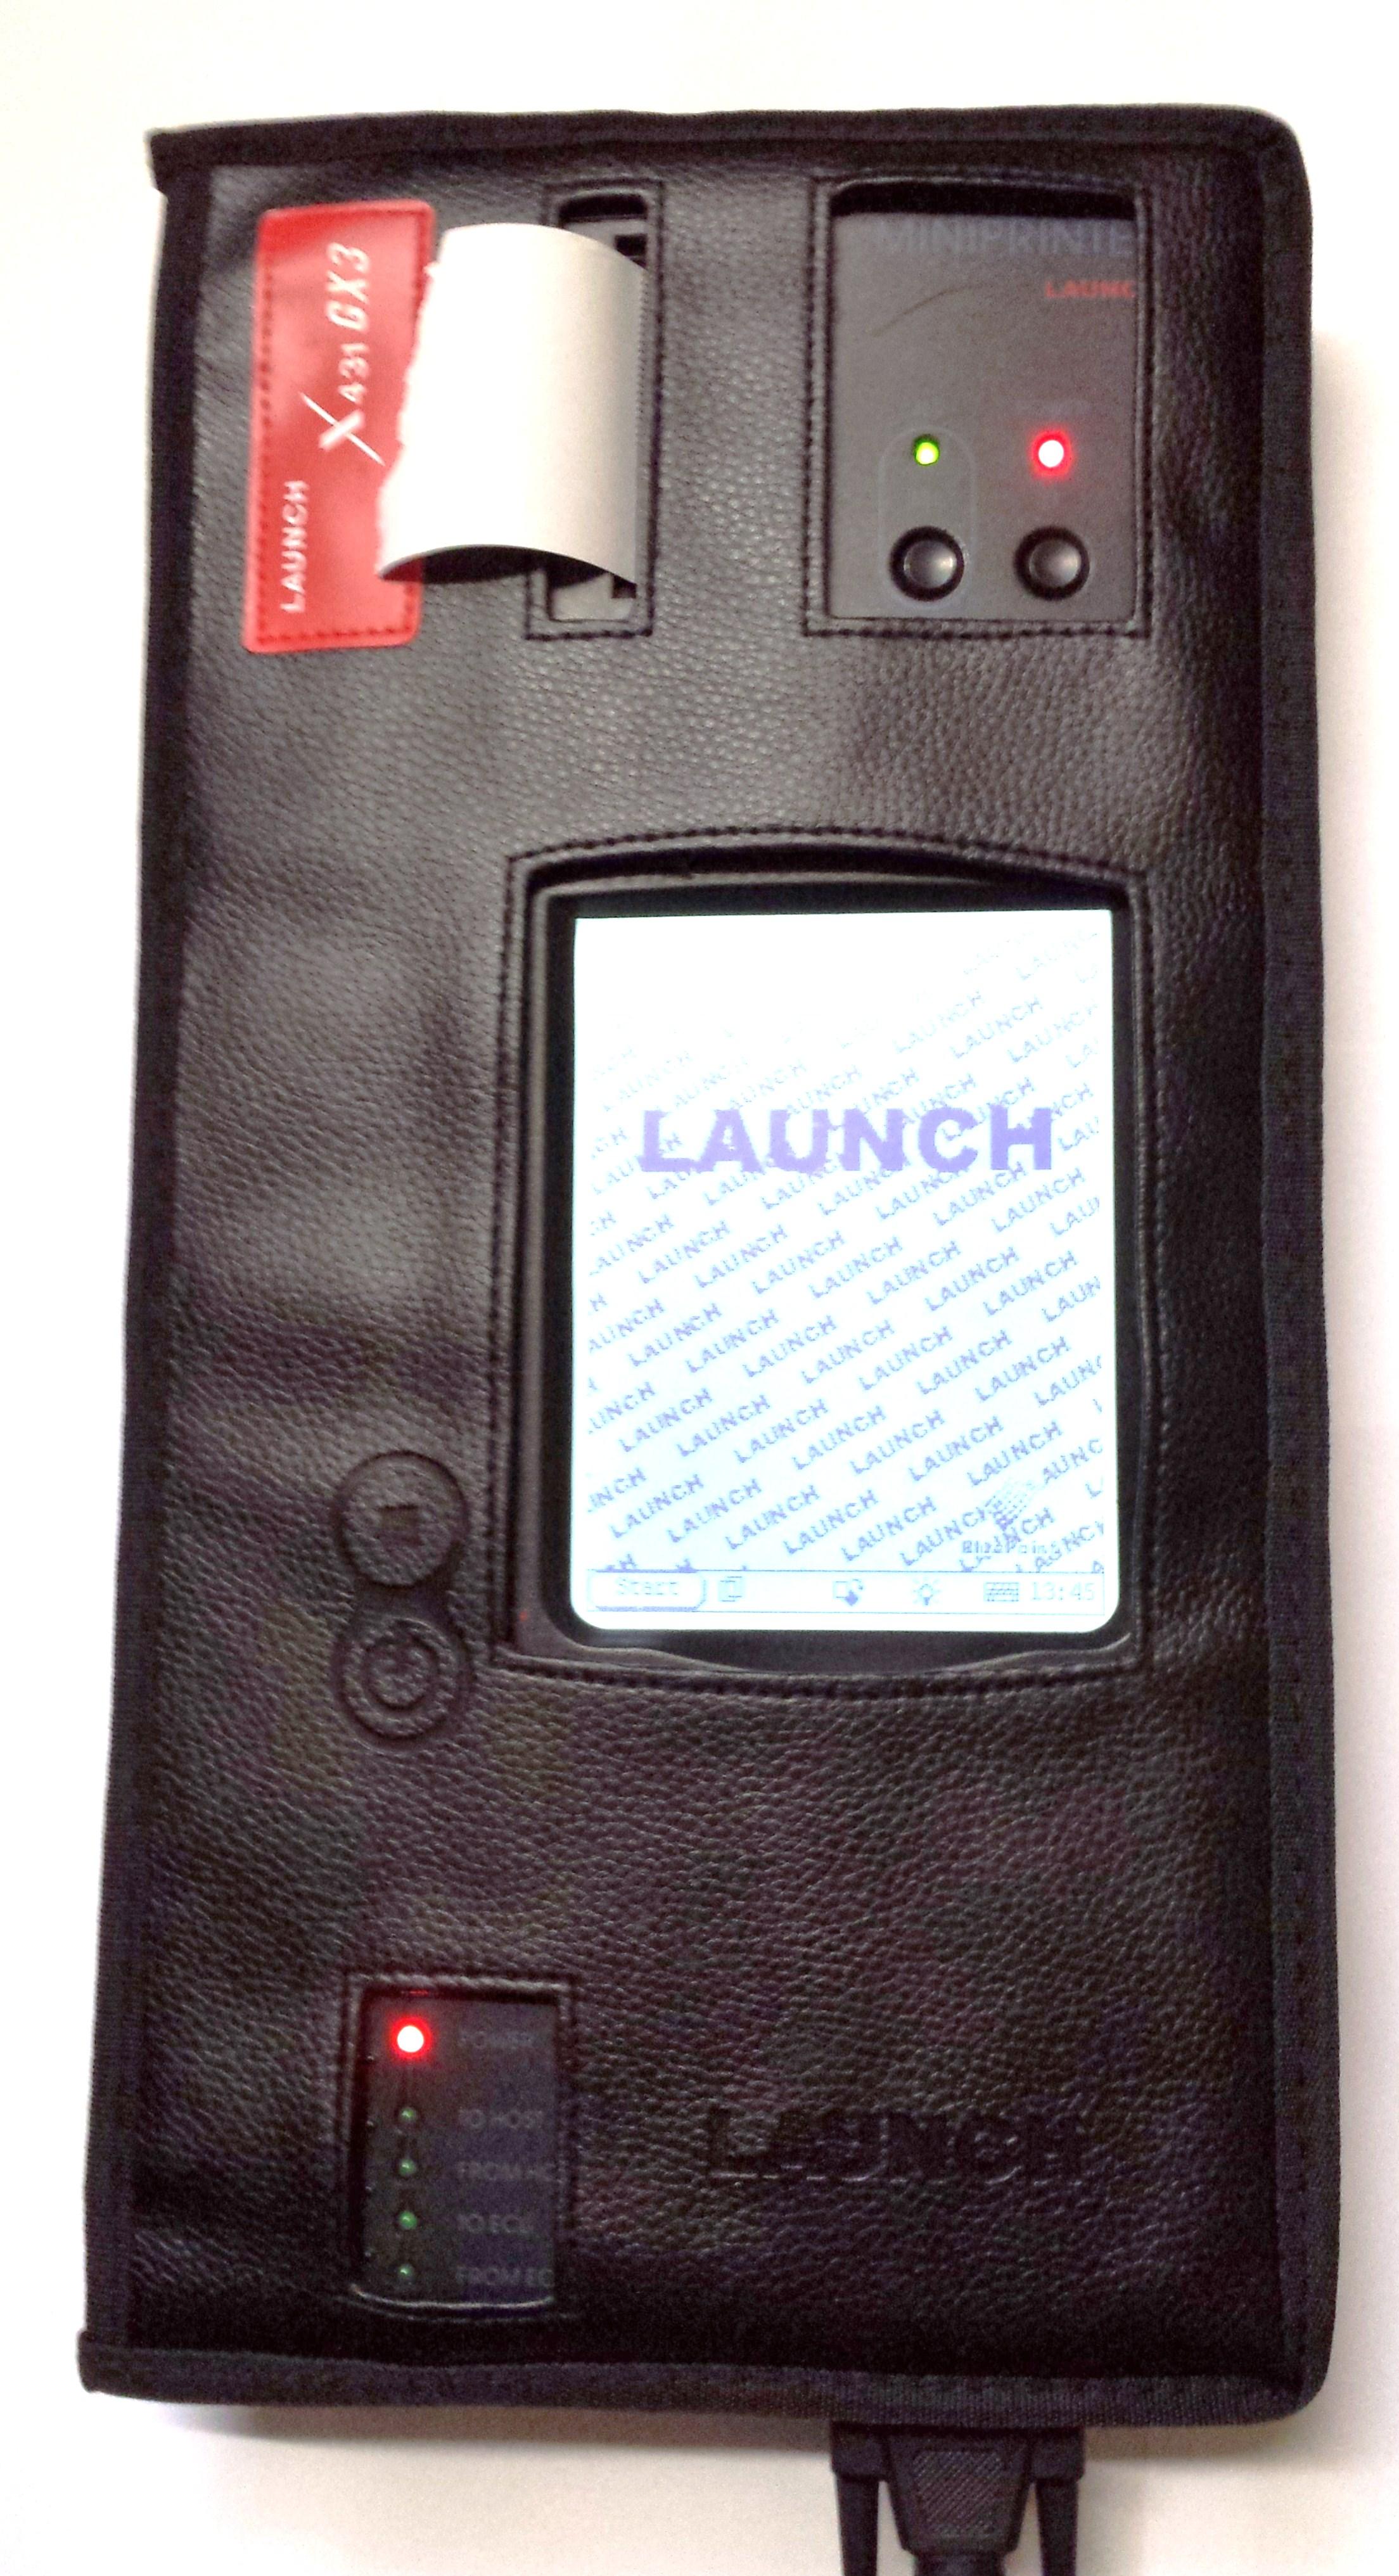 7e378cf5211 Launch X431 Master Update